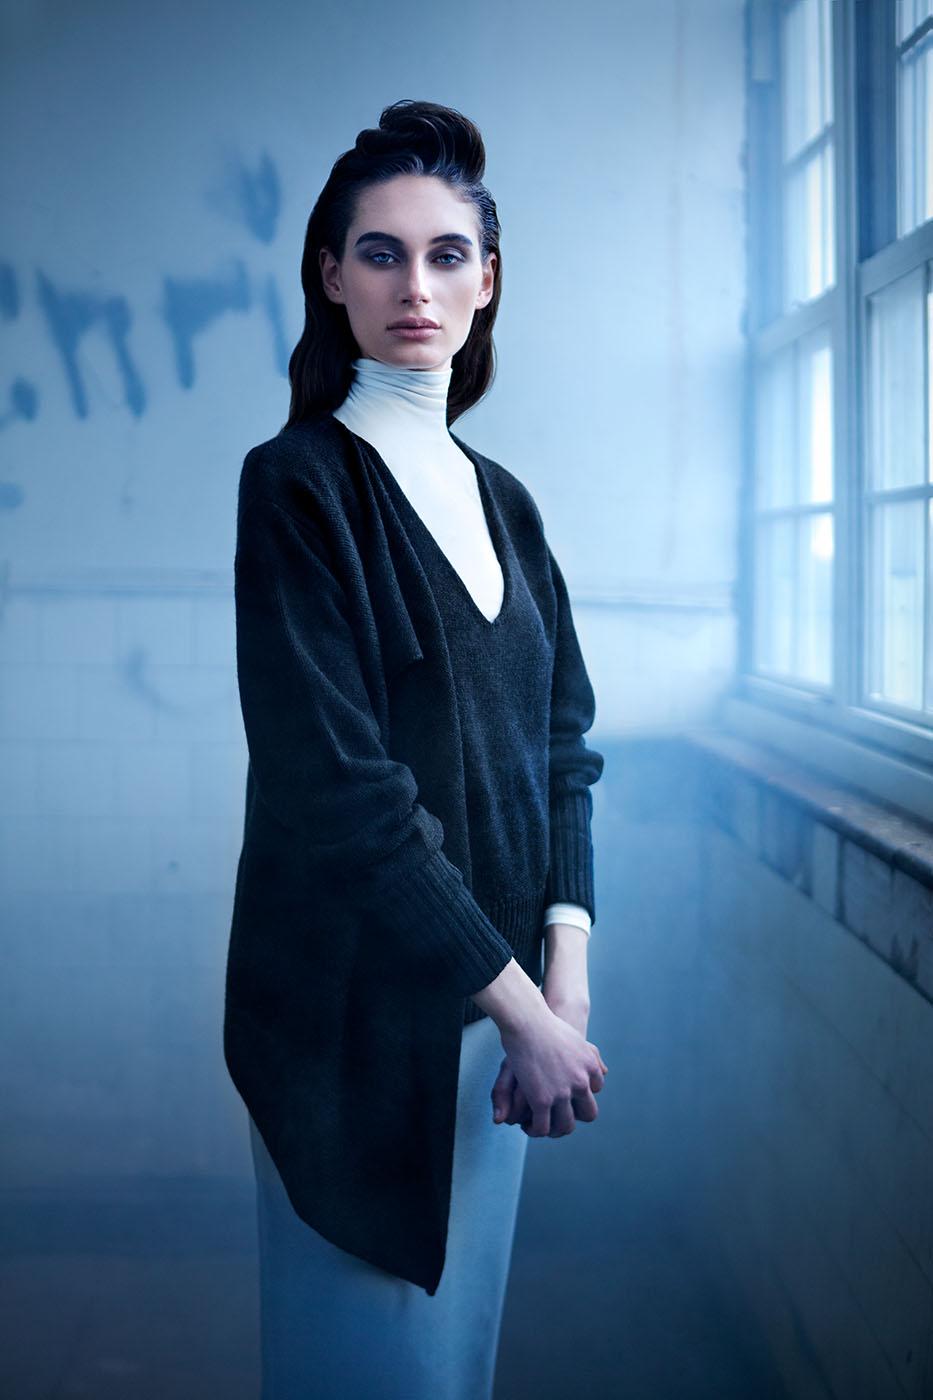 Photography by Julio Gamboa